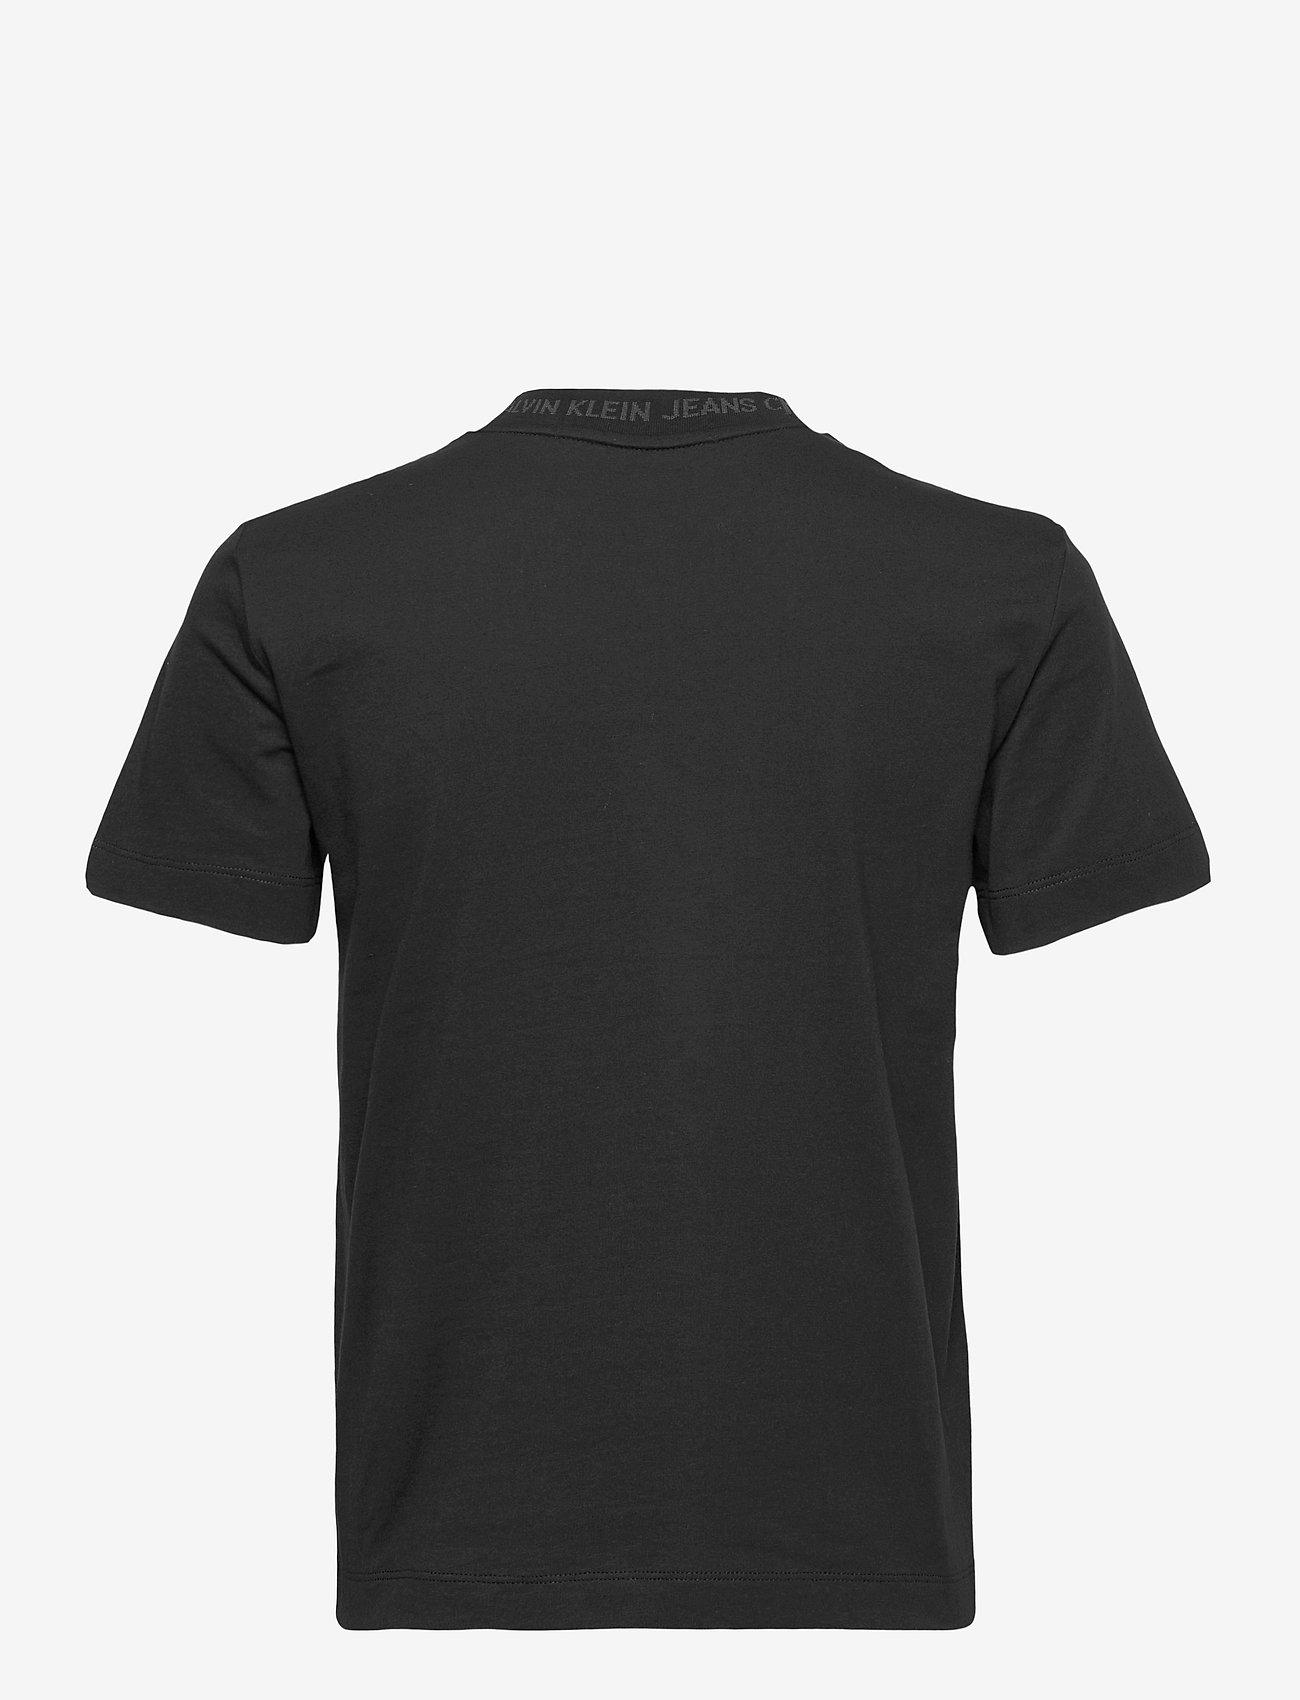 Calvin Klein Jeans - LOGO INTARSIA TEE - t-shirts - ck black - 1